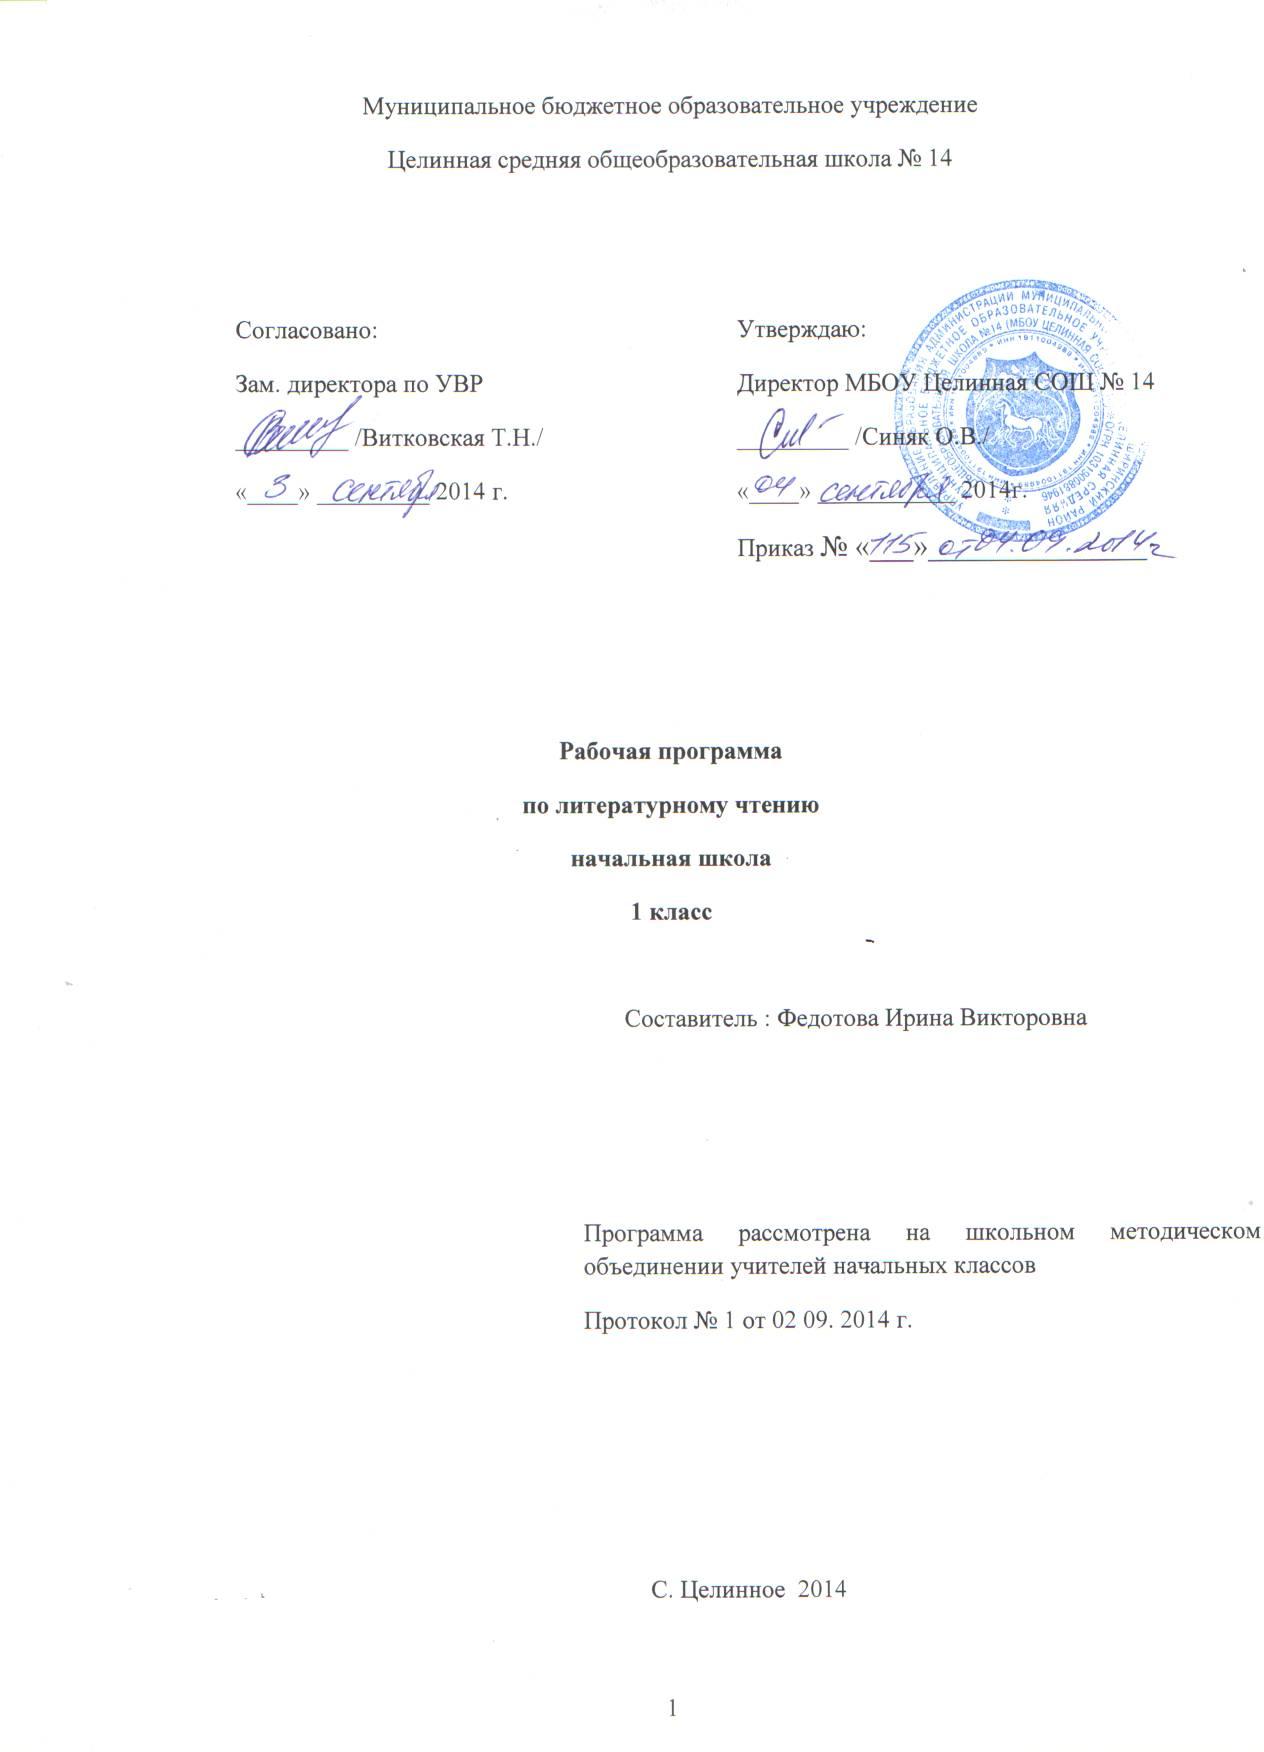 C:\Documents and Settings\Марина\Мои документы\Мои рисунки\Организатор клипов (Microsoft)\AEECDEEC.jpg